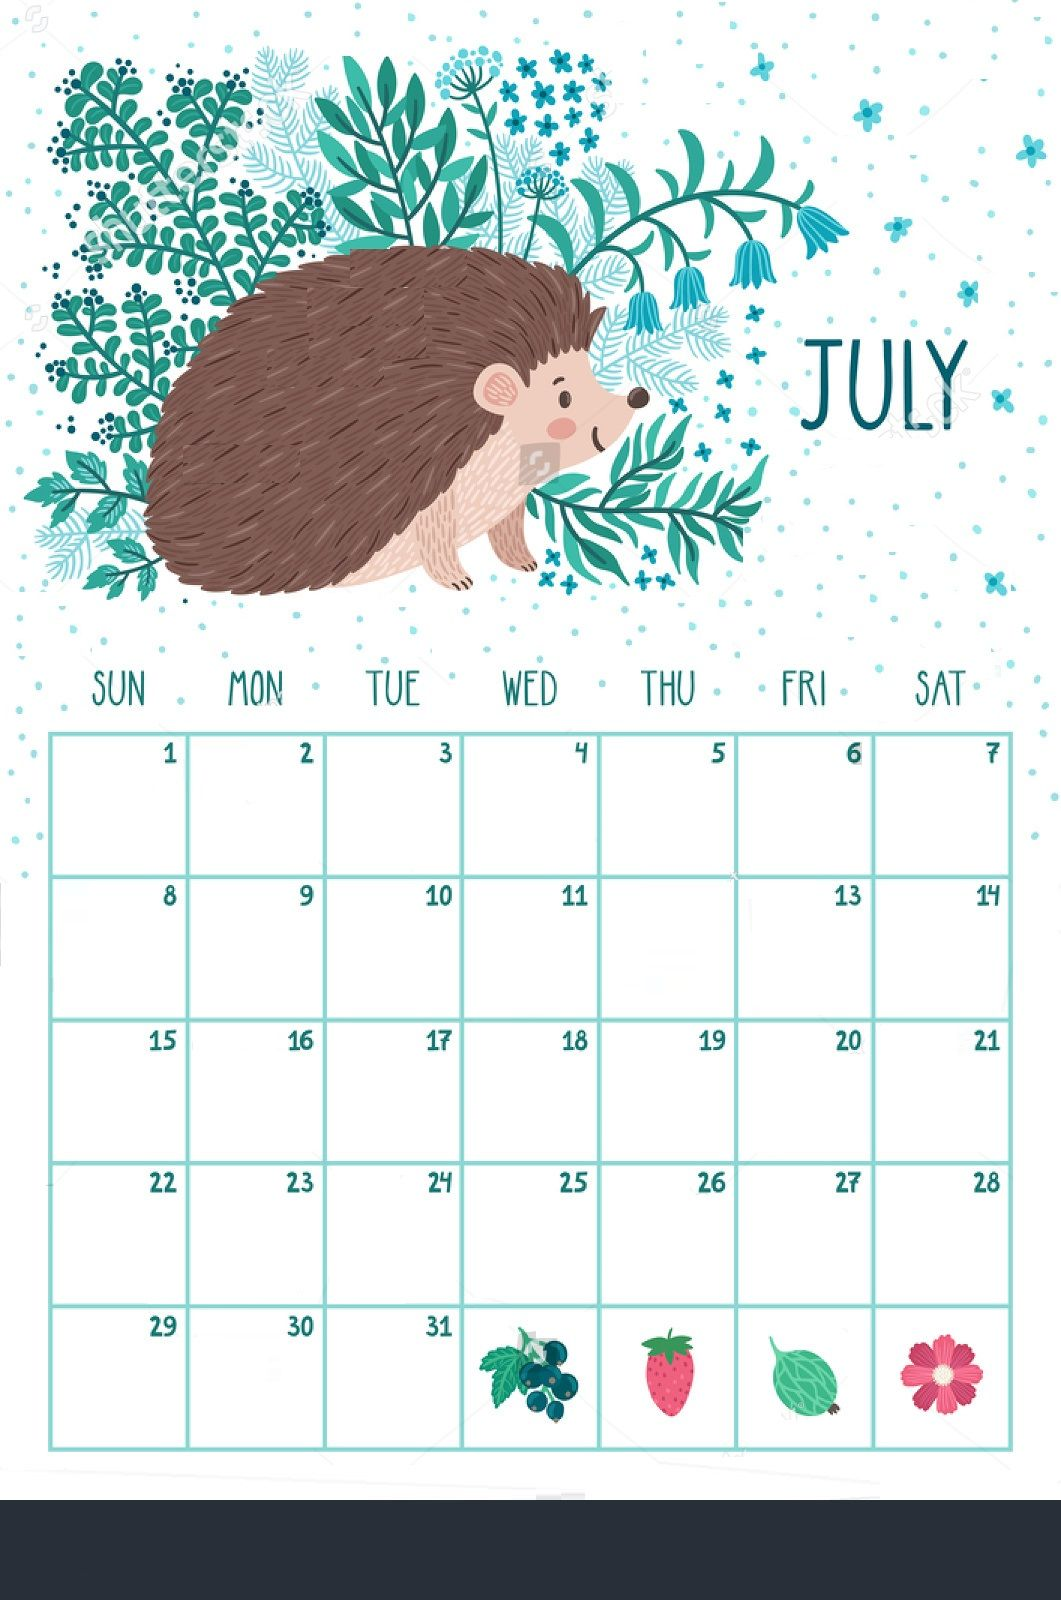 Best July Month 2018 Calendar Designs Calendar Design Planner